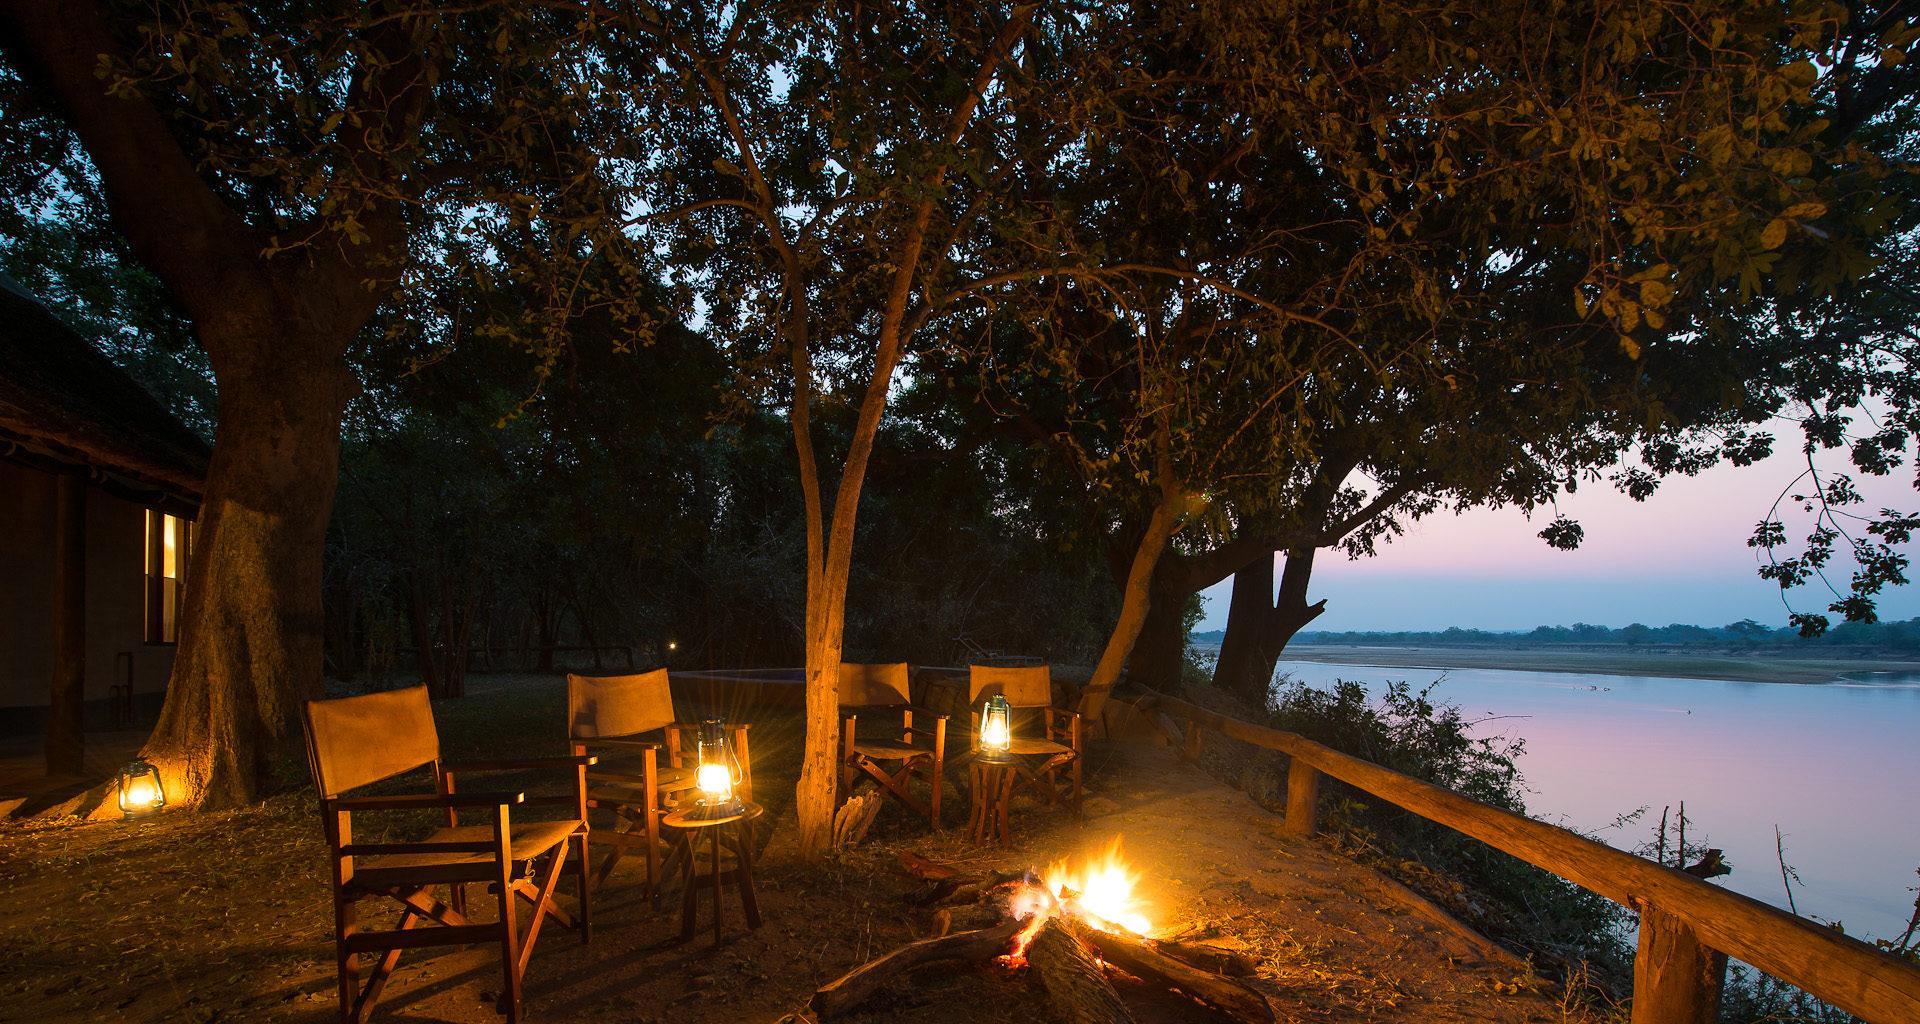 Robins-House-Zambia outside